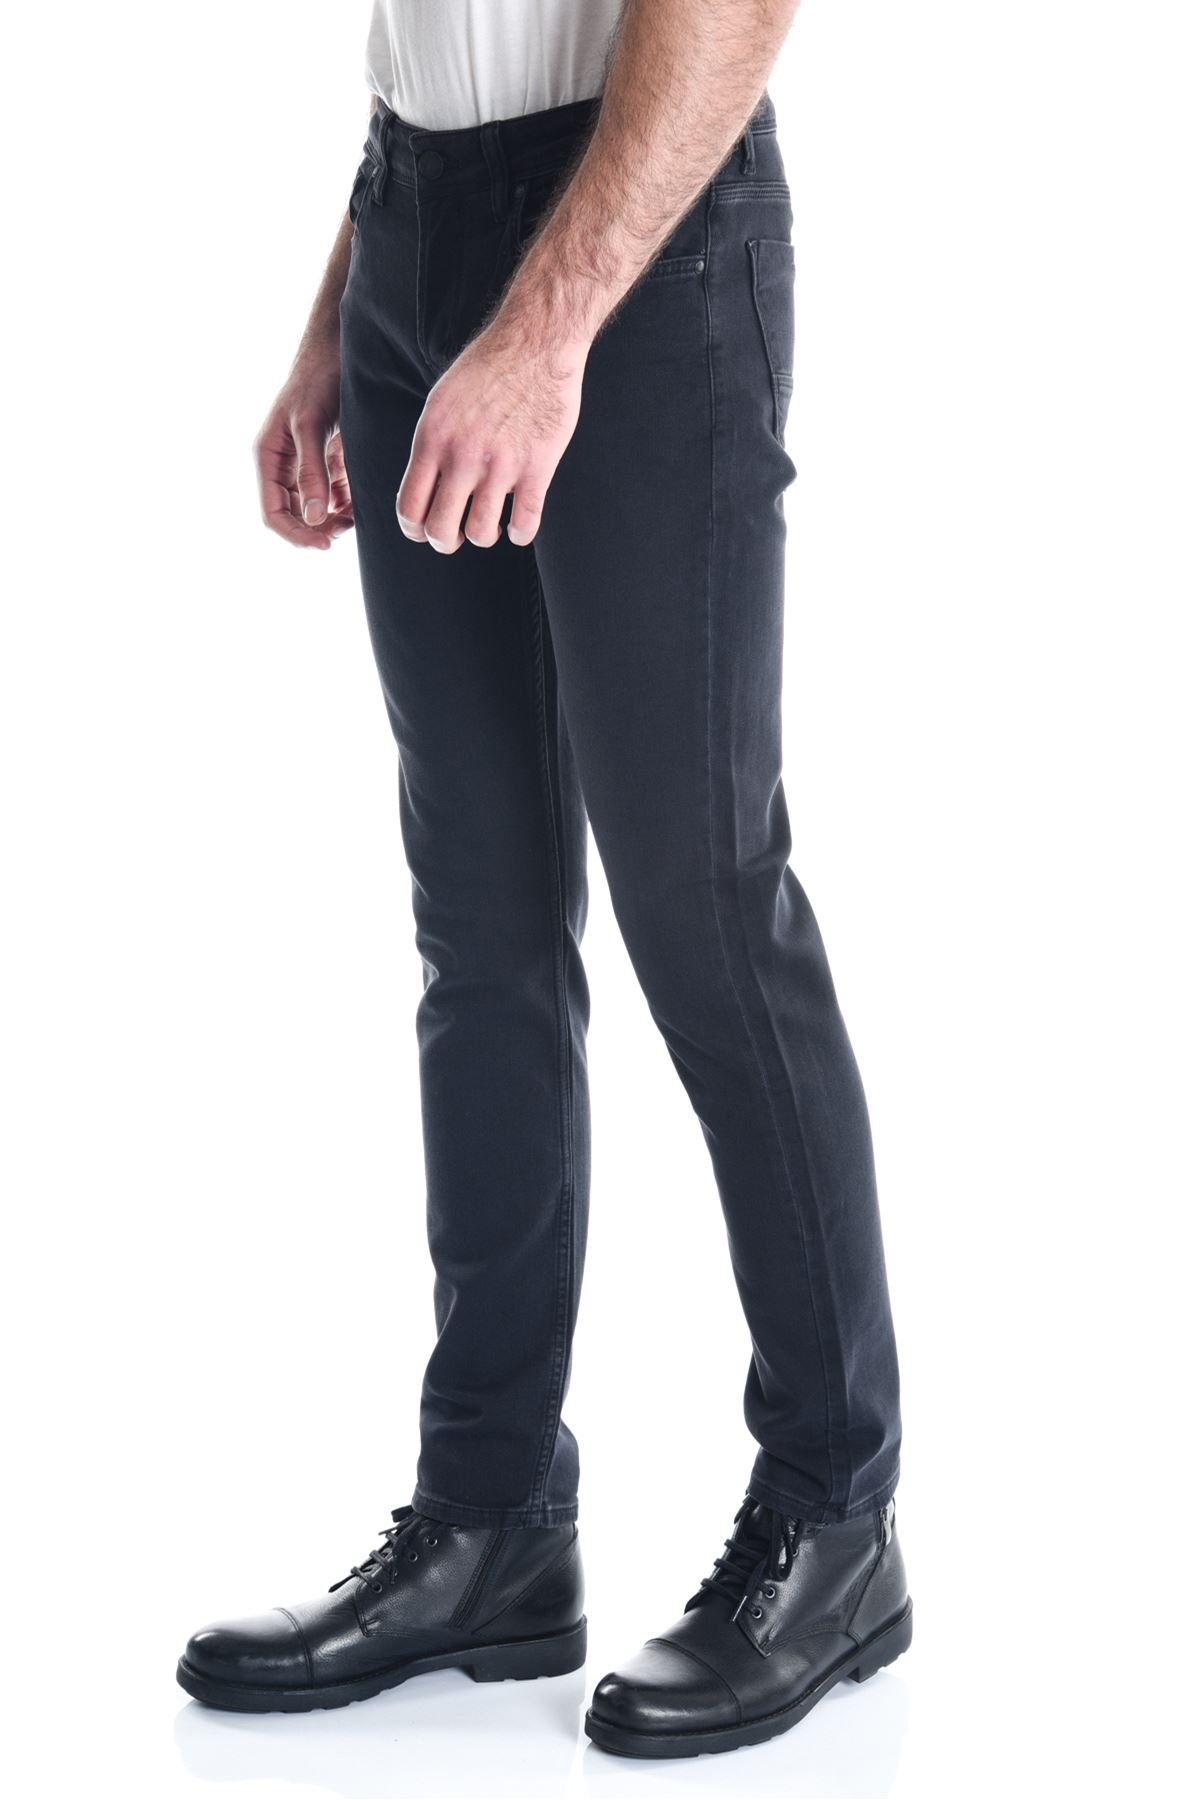 Siyah Sade Armürlü Örme Erkek Kot Pantolon